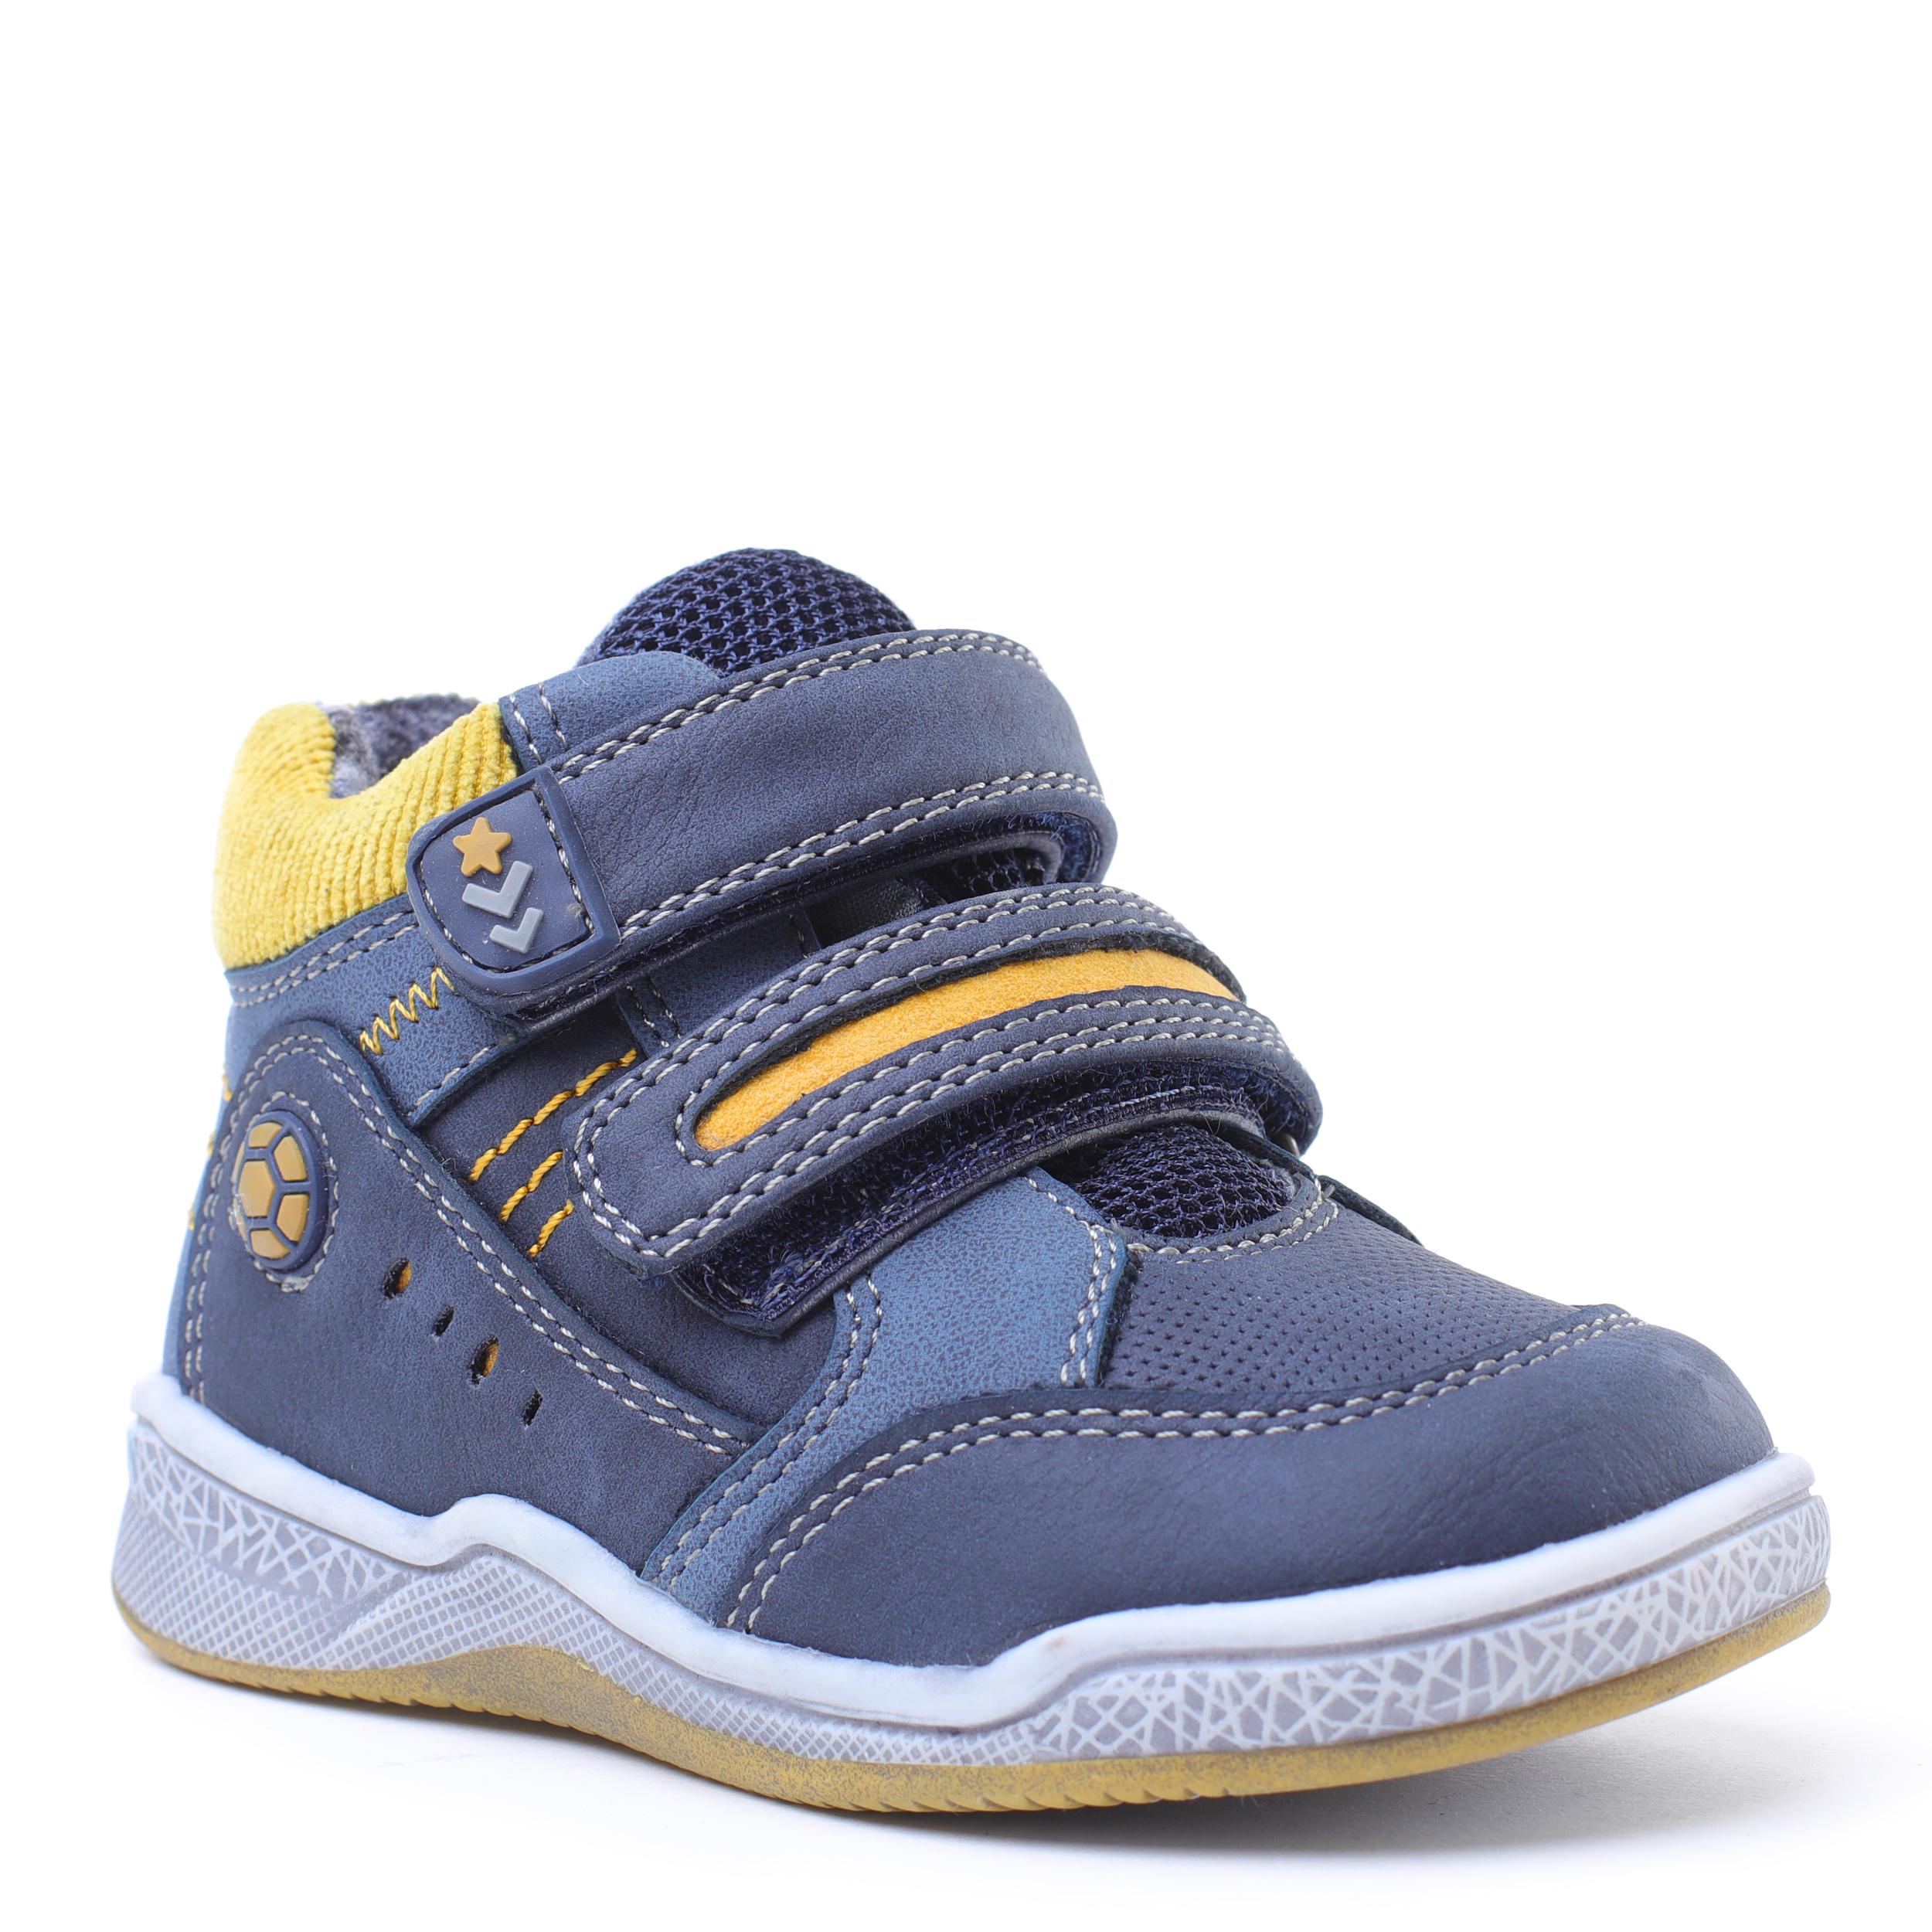 e4d6fe8b1 387221 Синие ботинки для мальчика PlayToday Baby PlayToday Baby ...